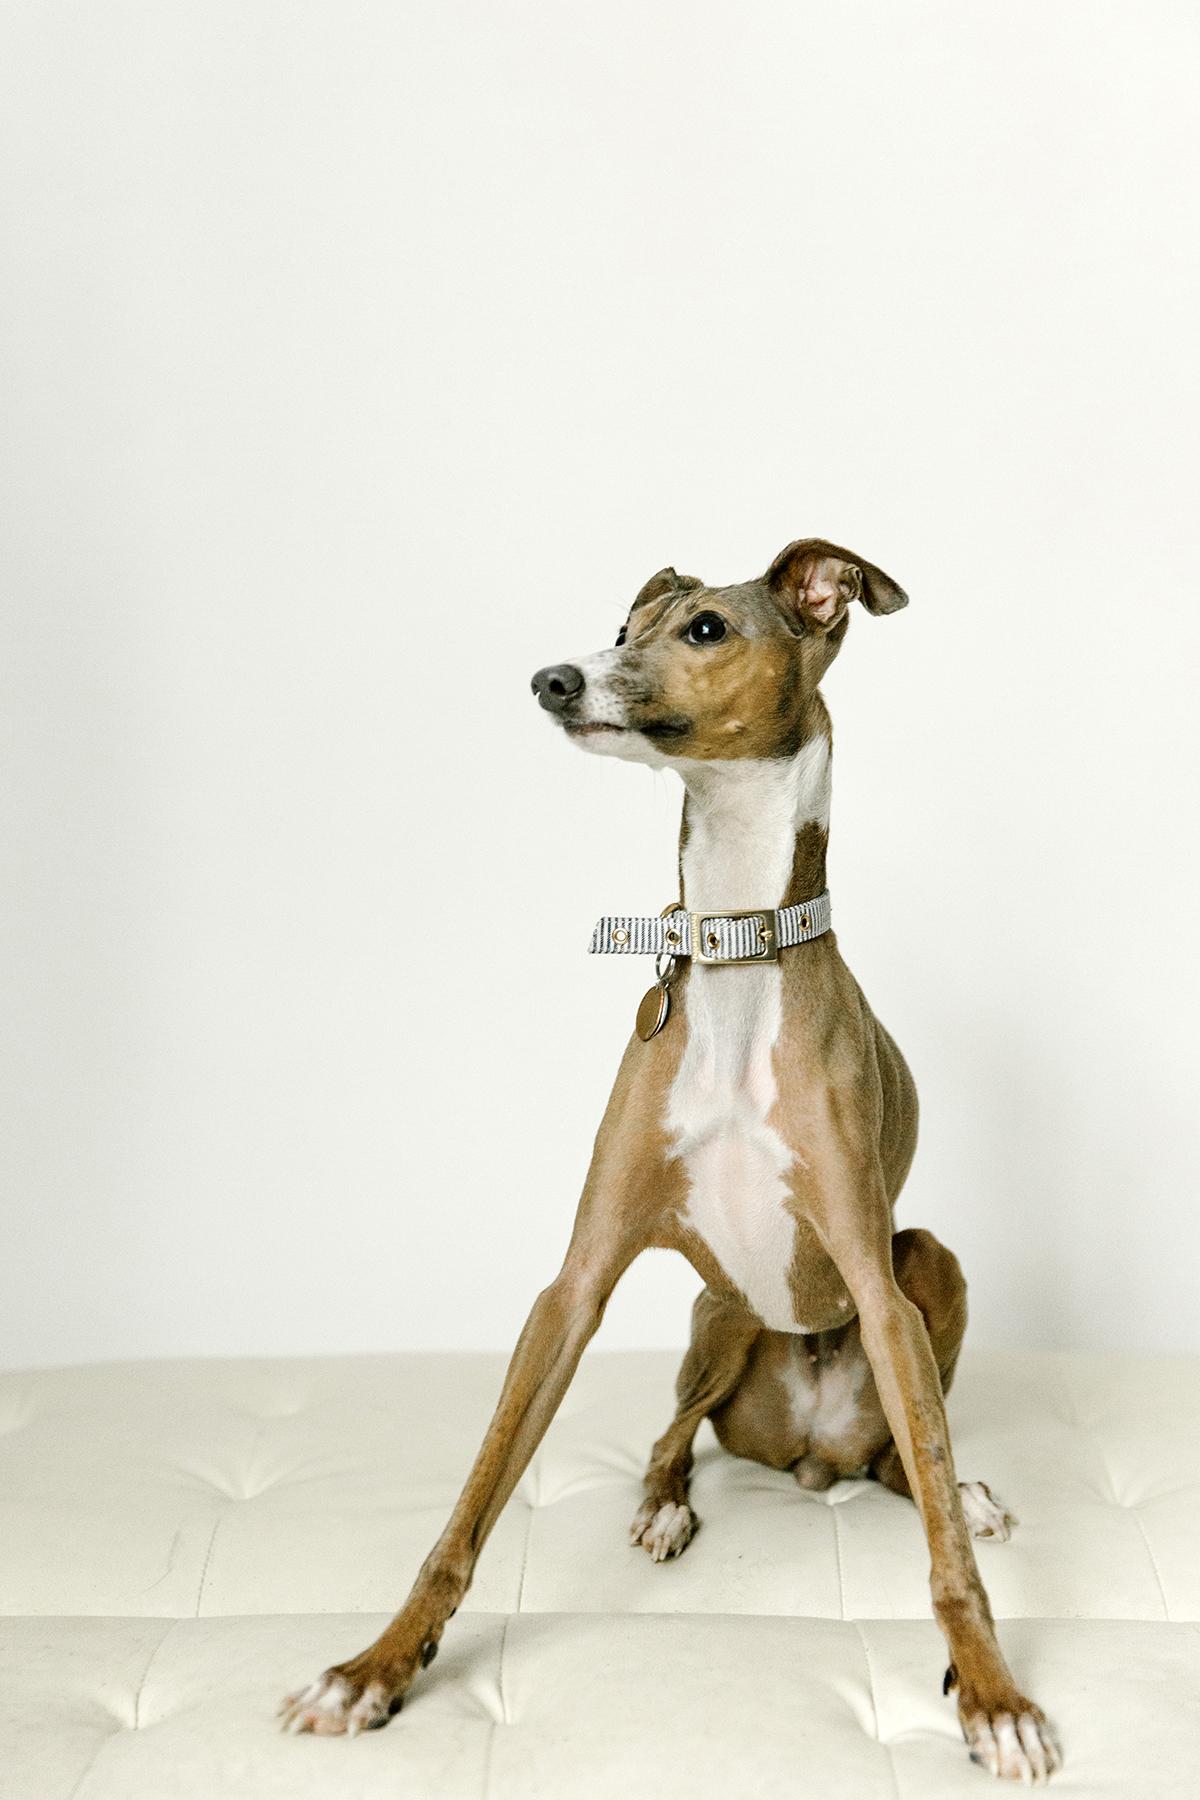 09072019-Dogs-064.jpg